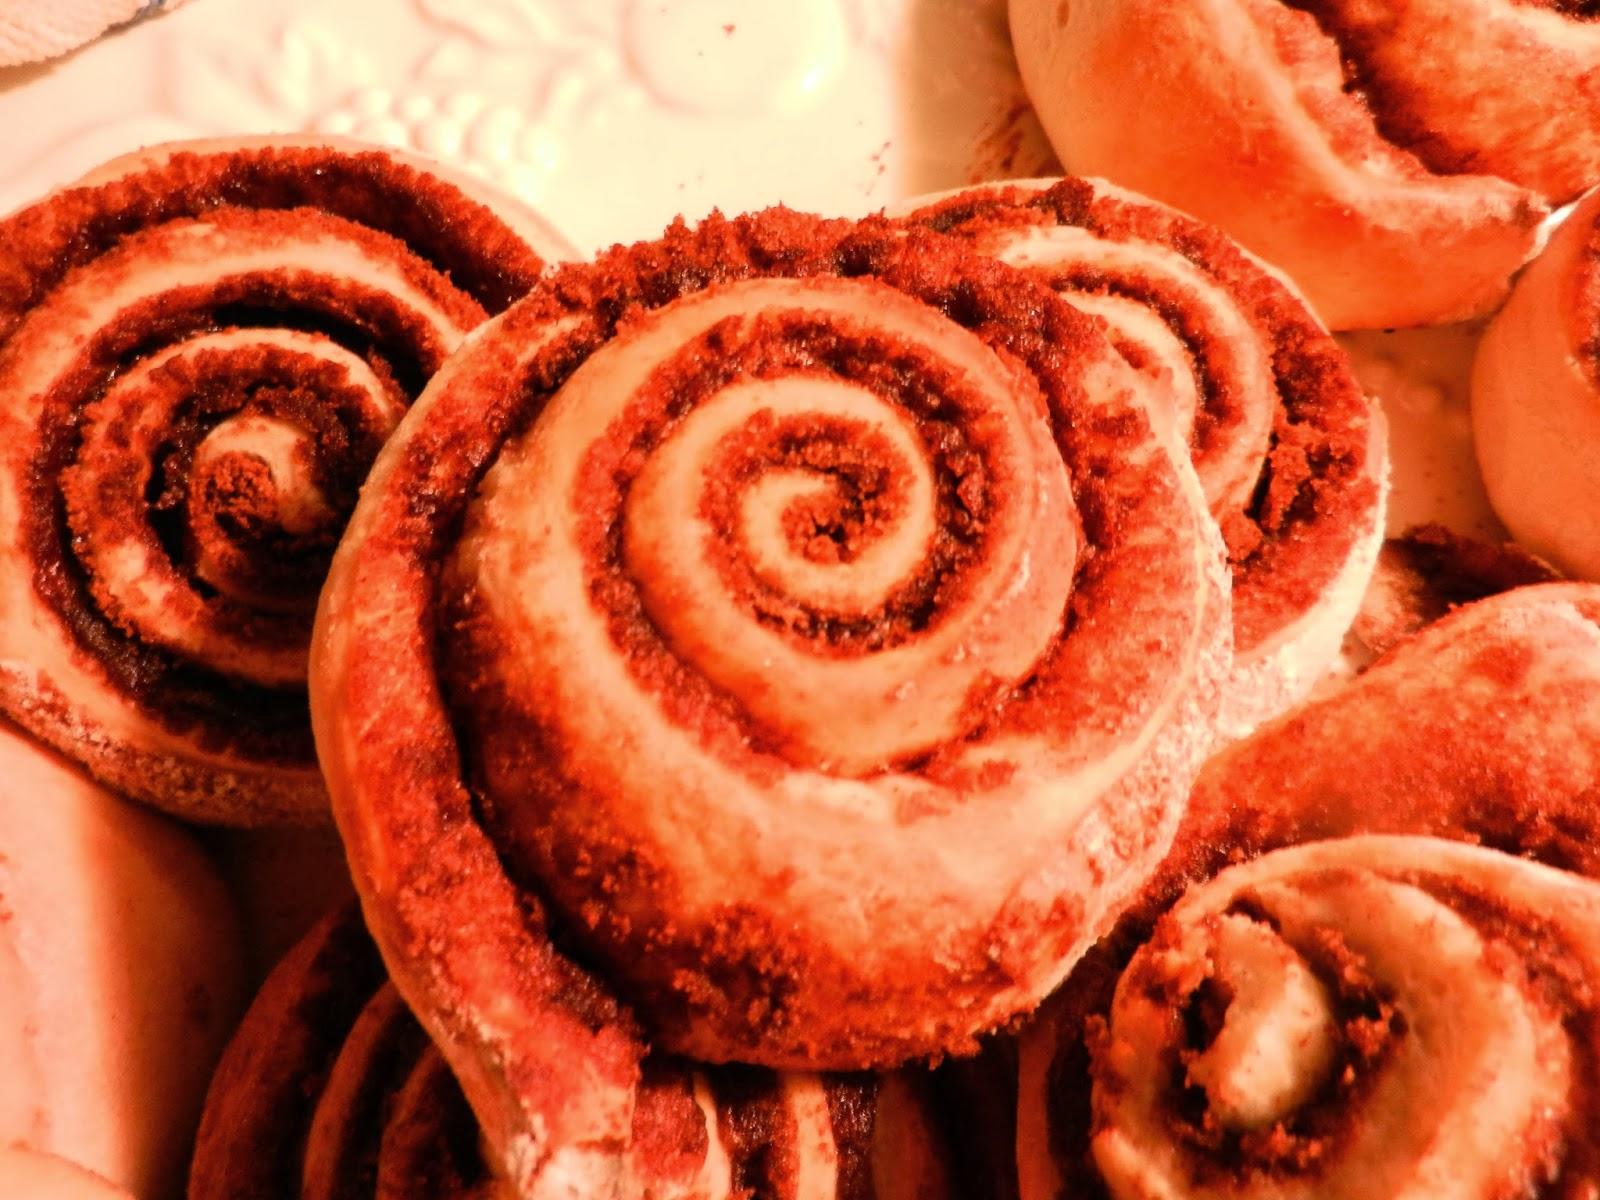 cinnamon rolls pic